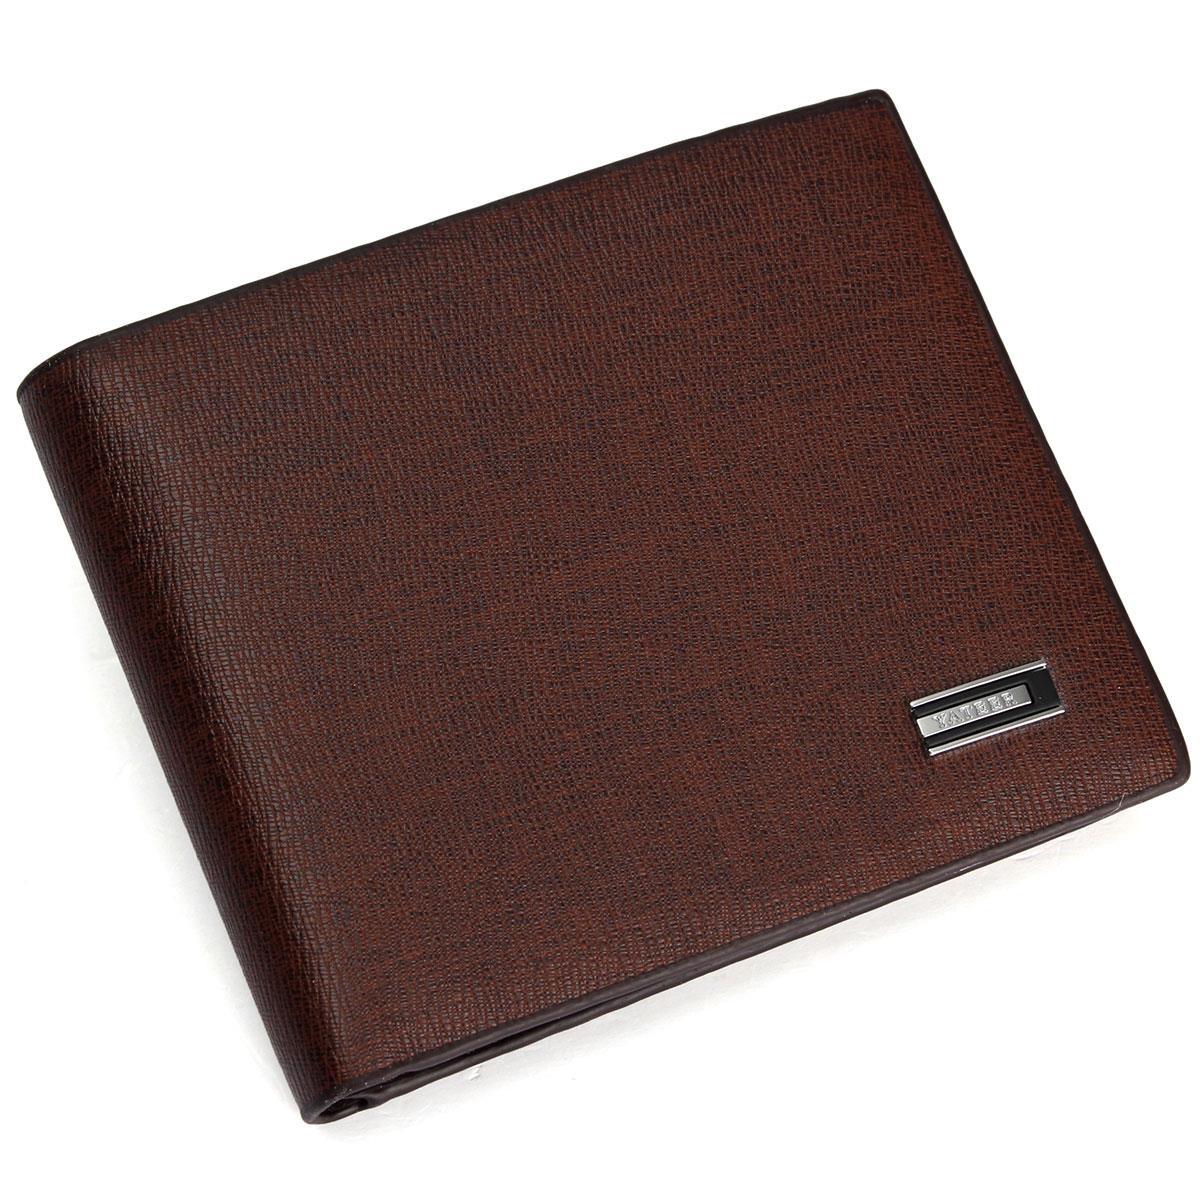 2015 Men Business Short Wallets Wood Texture Ultrathin Interlayer Leather Pouch Credit Card Holder Money Billfold Coin Purse<br><br>Aliexpress